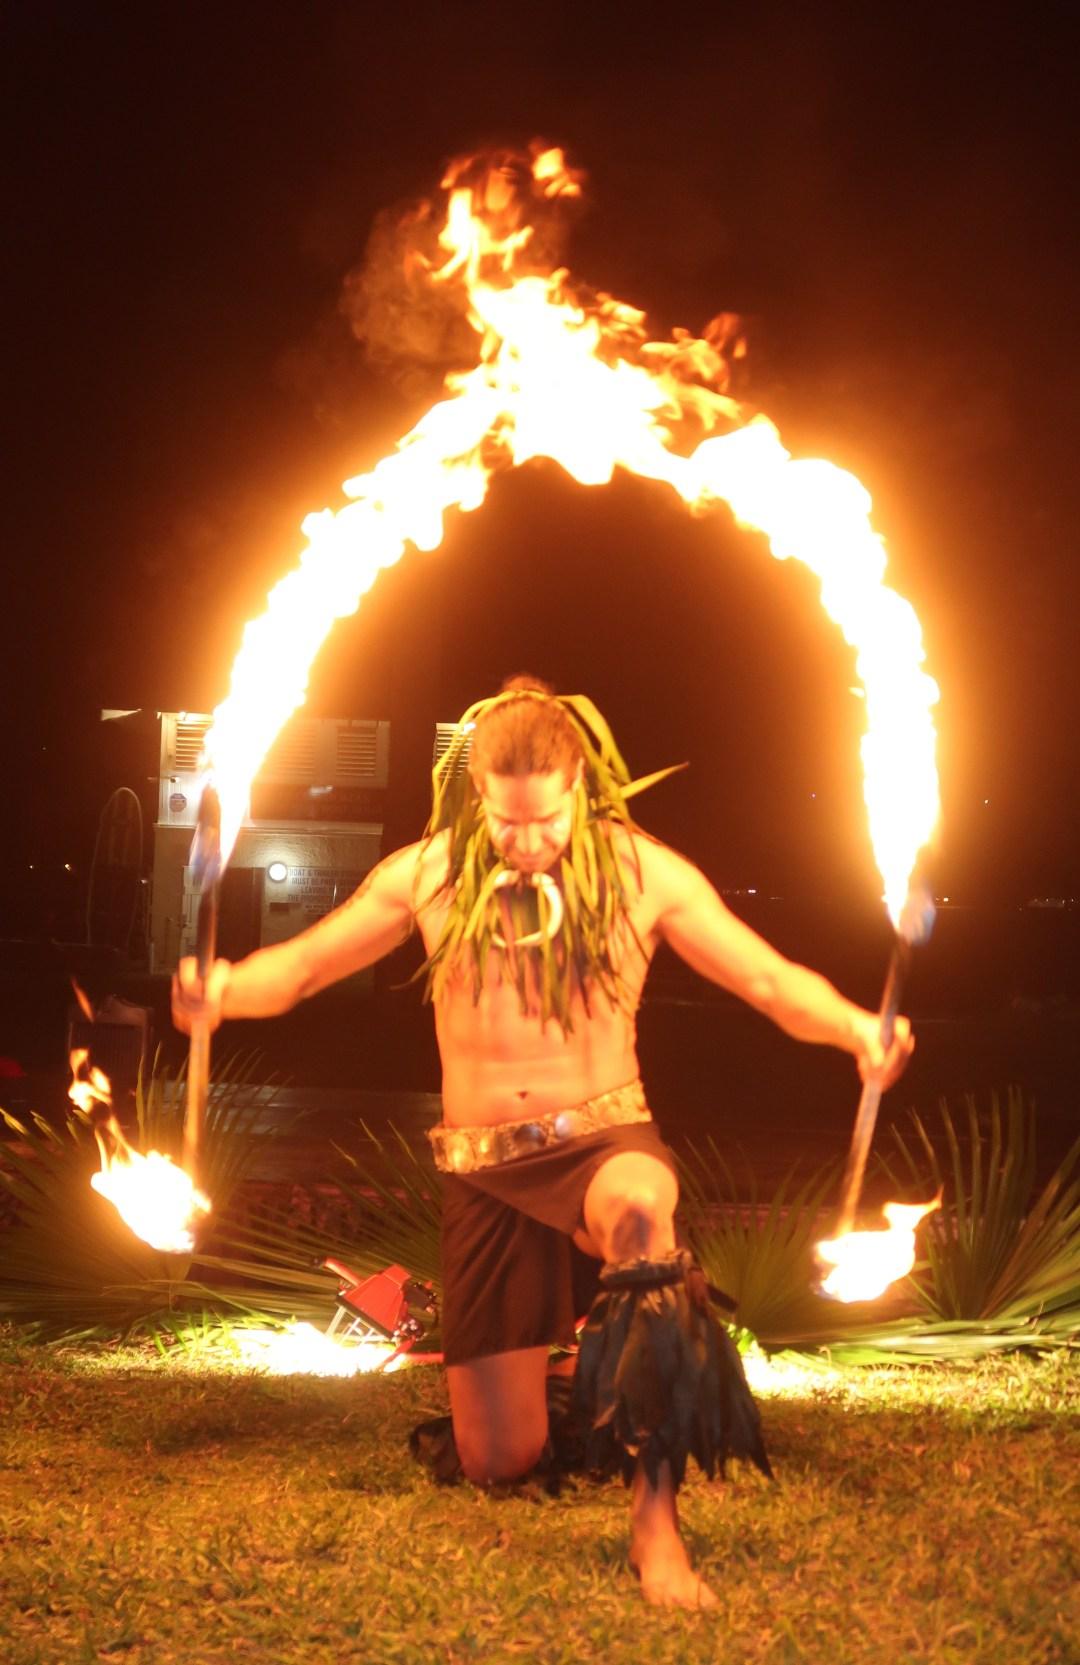 Fire Dancing- Photo by Aaron Wormus